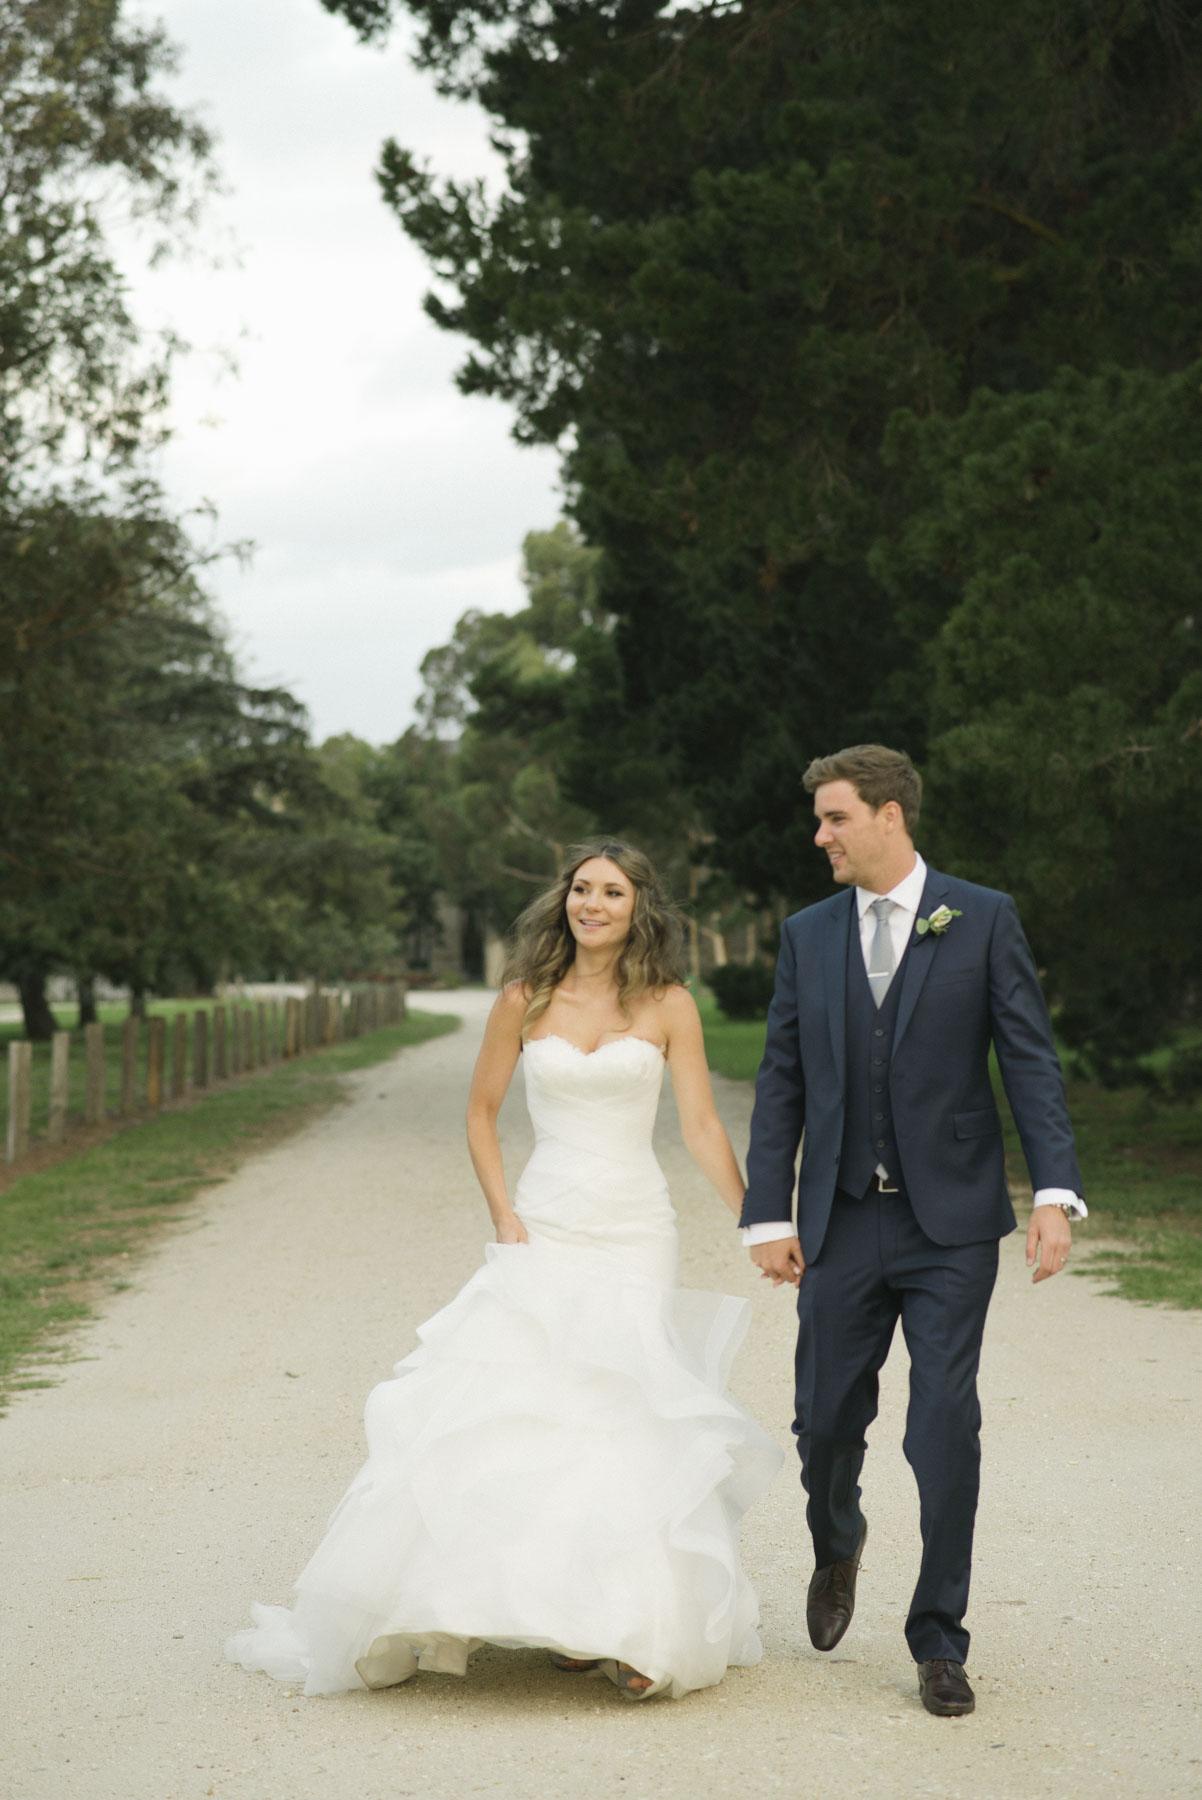 1501vand-388alan_moyle_wedding_portrait_brighton_bayside_werribee_estate_mansion_zoo_rustic_styled_garden_mansion_candid_documentry_victoria_whitelaw.jpg